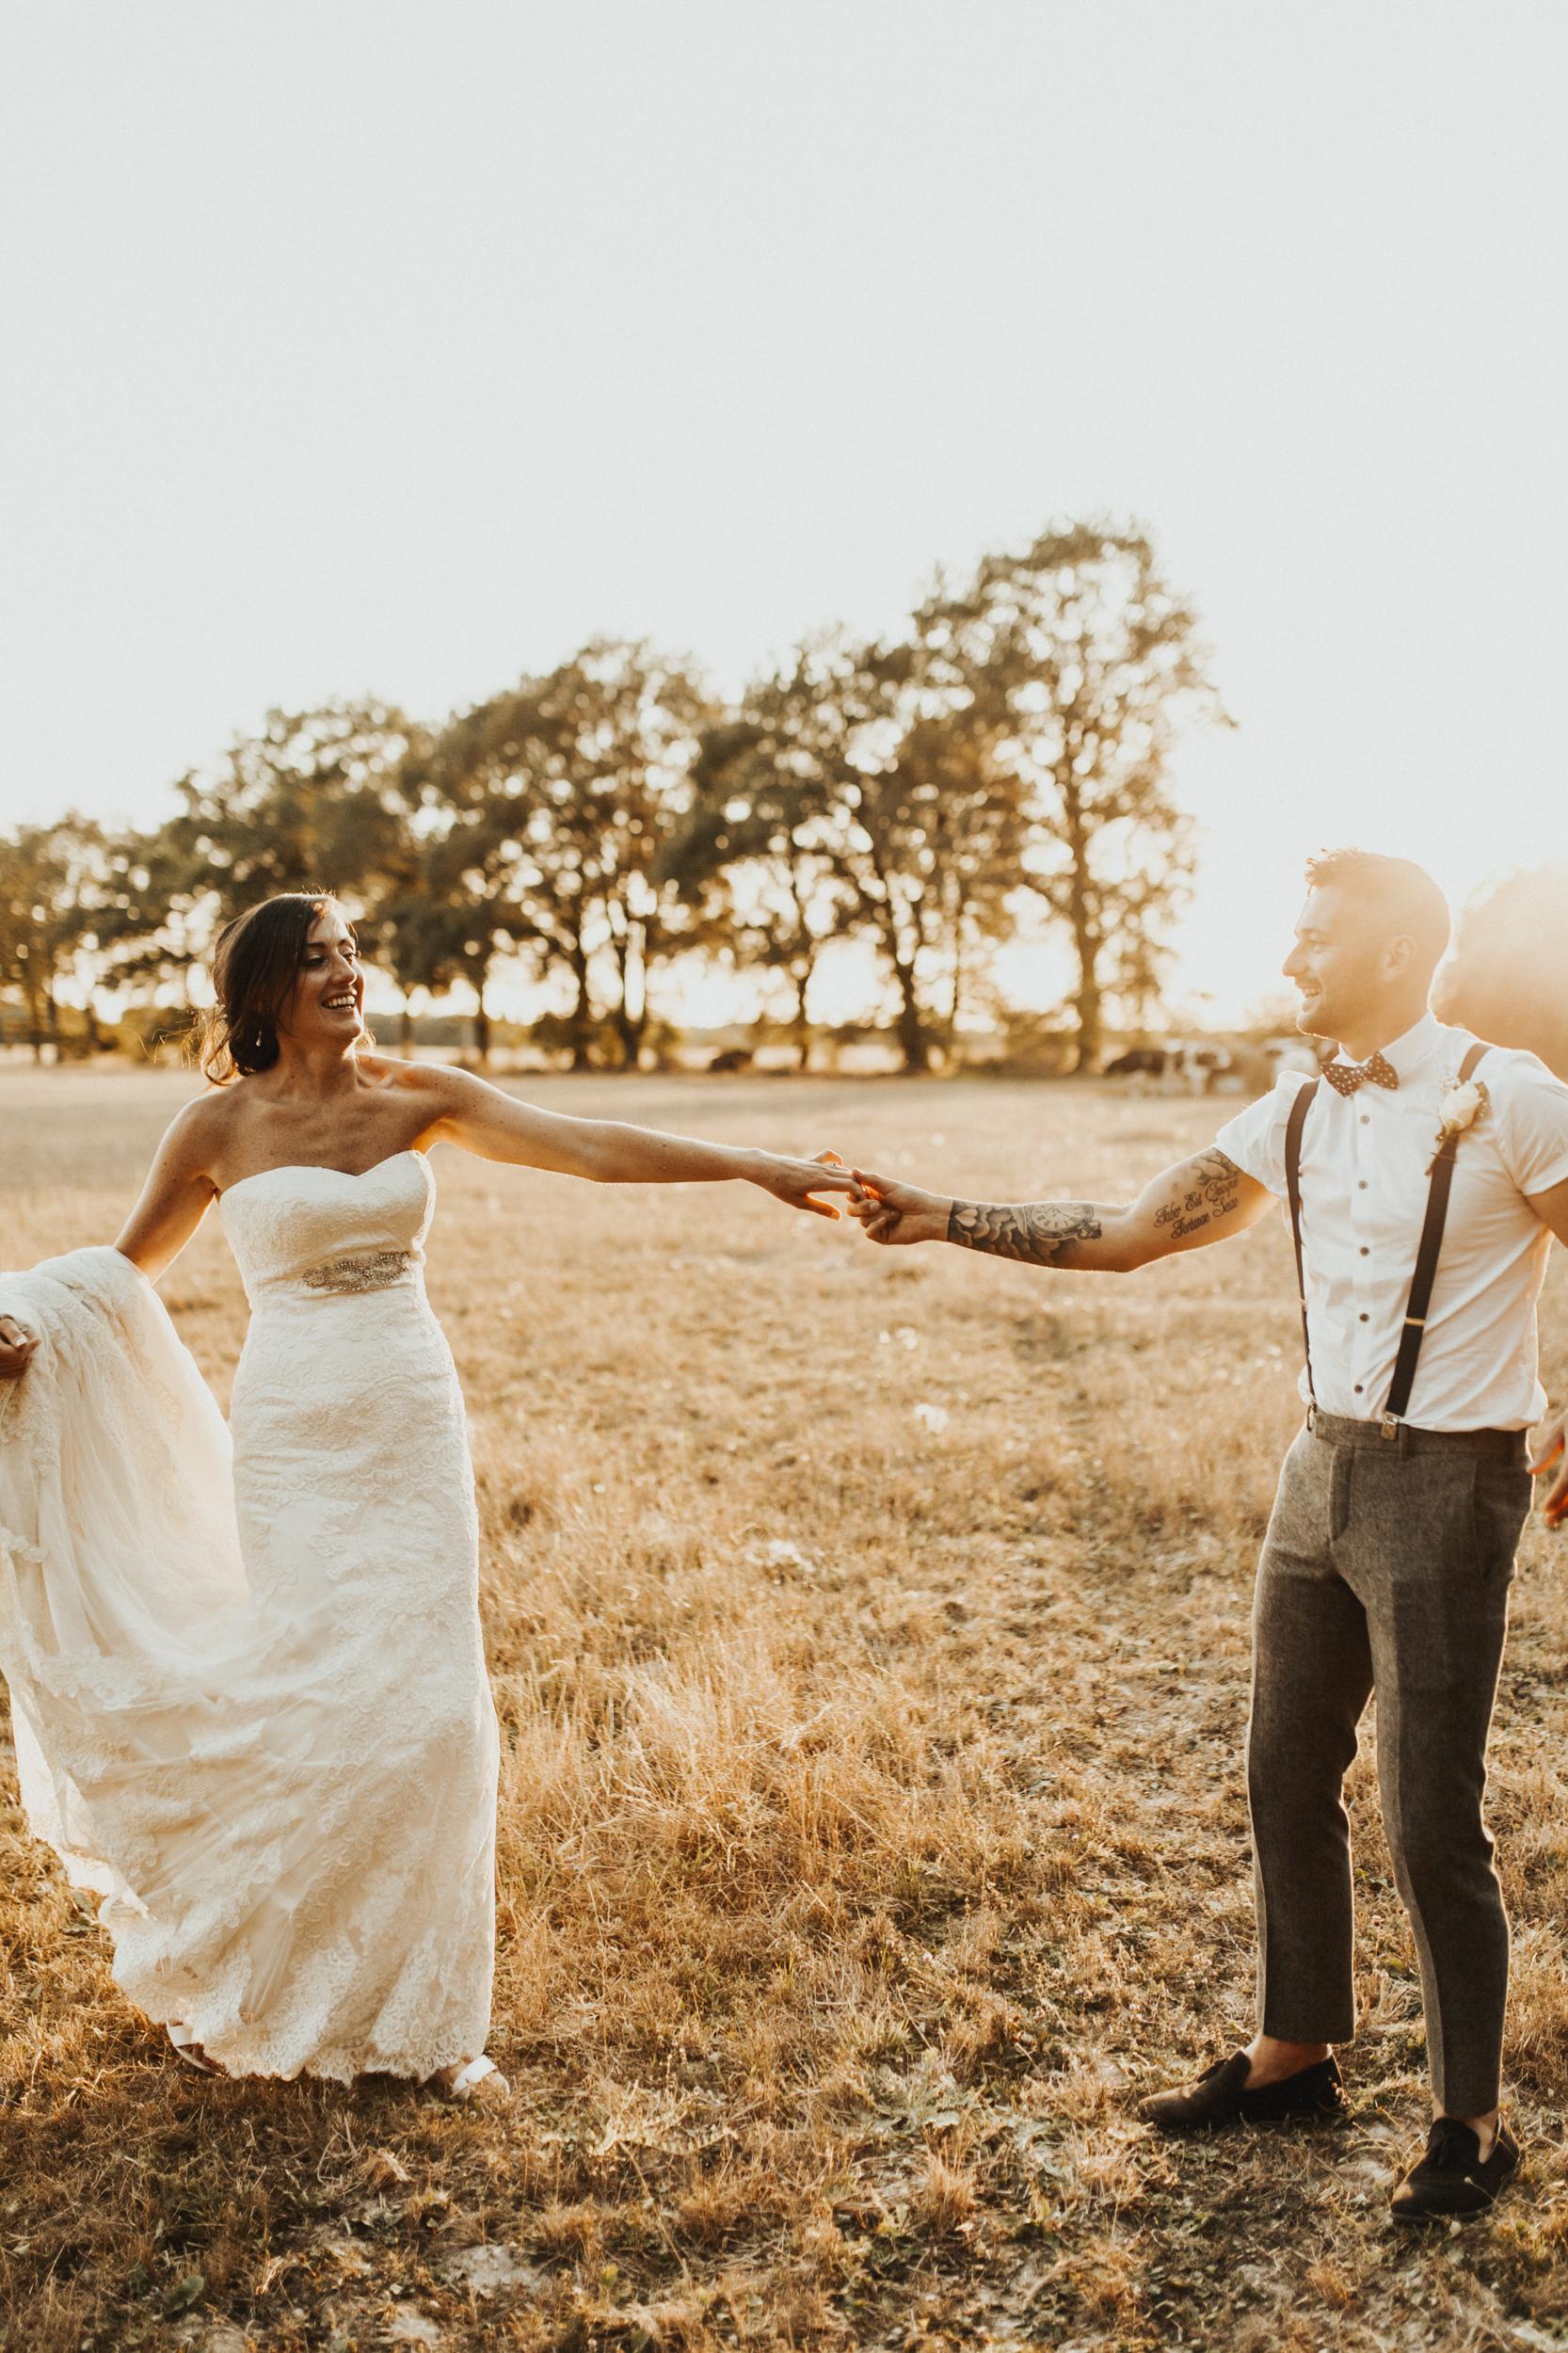 Amy-Zac-Destination-Wedding-France-Manoir-Foulquetiere-Darina-Stoda-Photography-90.jpg